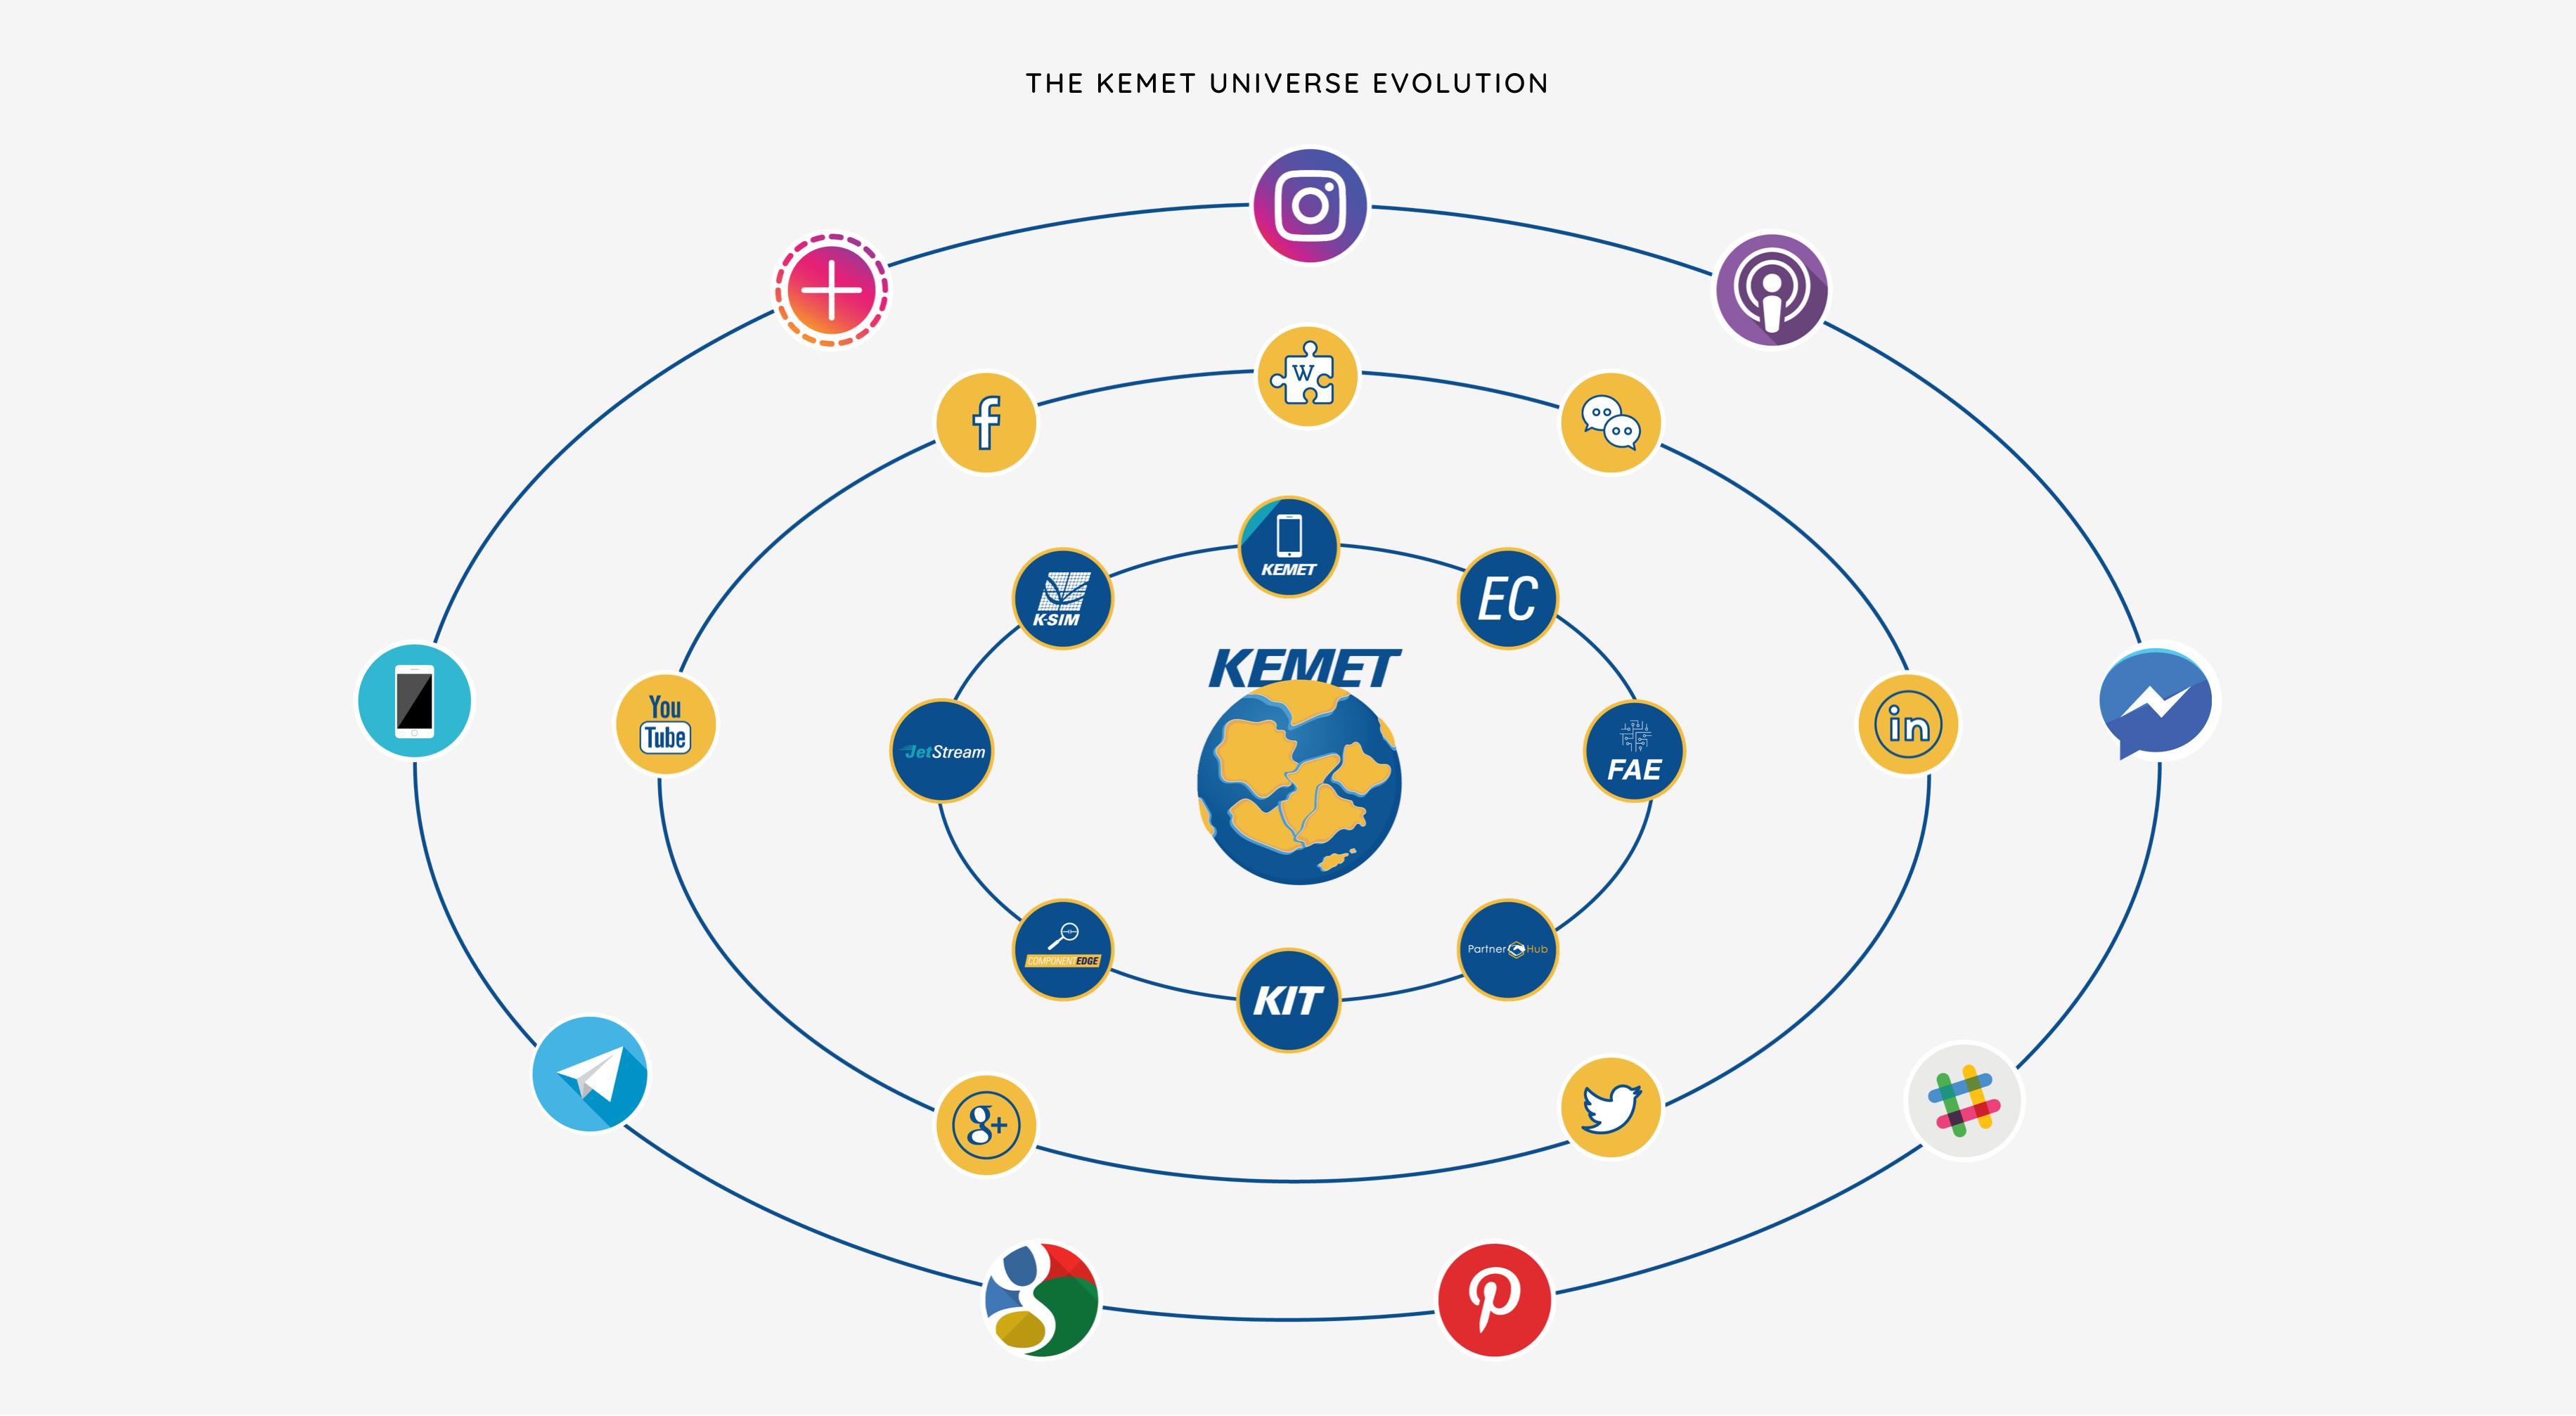 The KEMET Universe